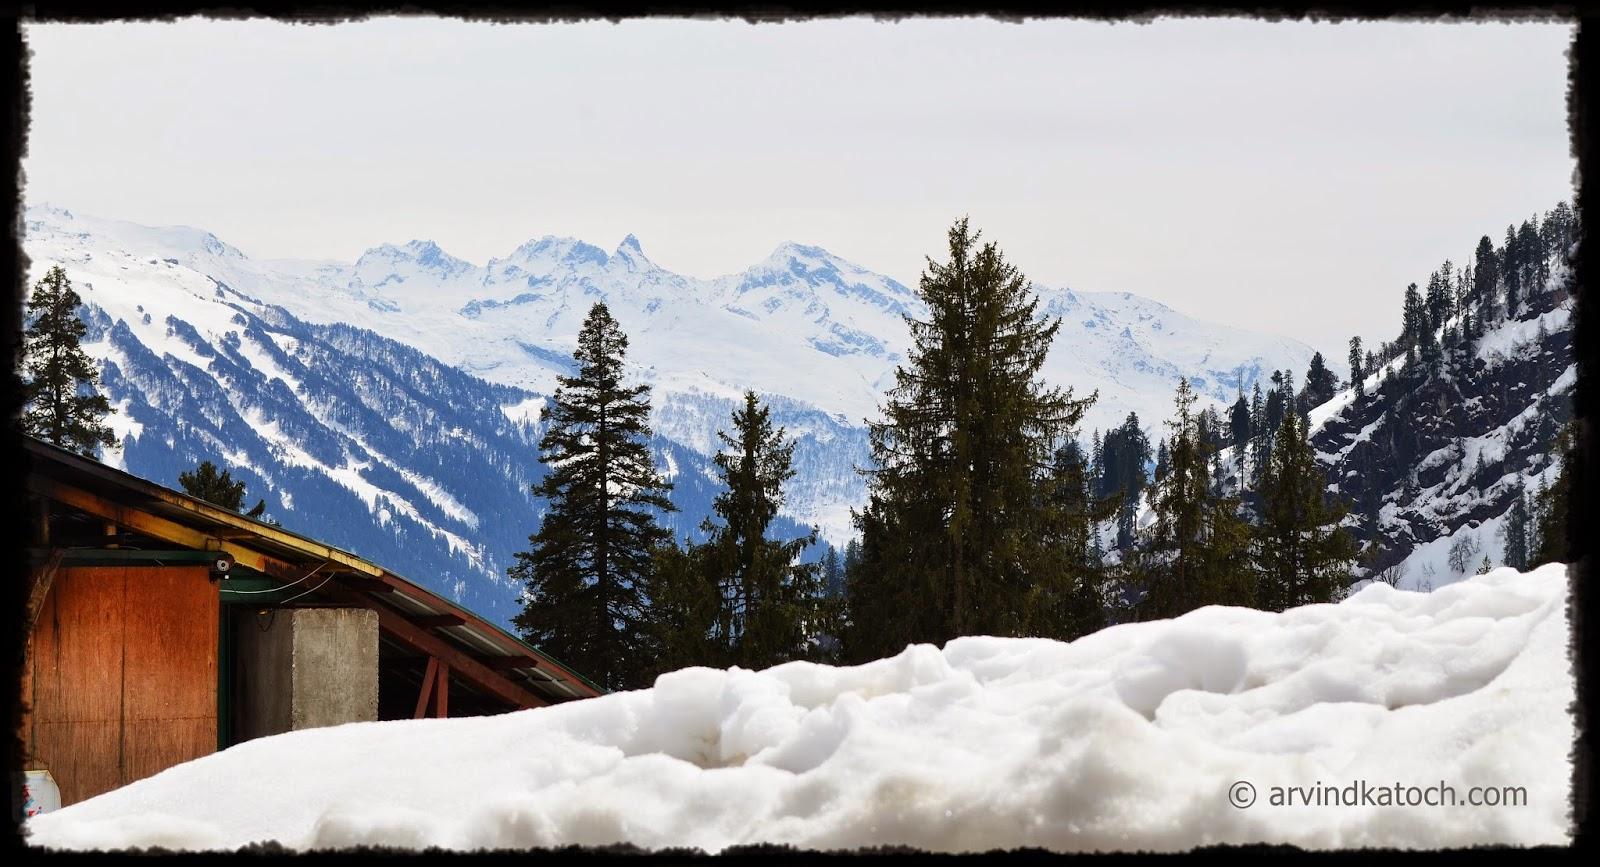 Soland Valley, soland nala, Manali, Himachal Pradesh, Snow, hills